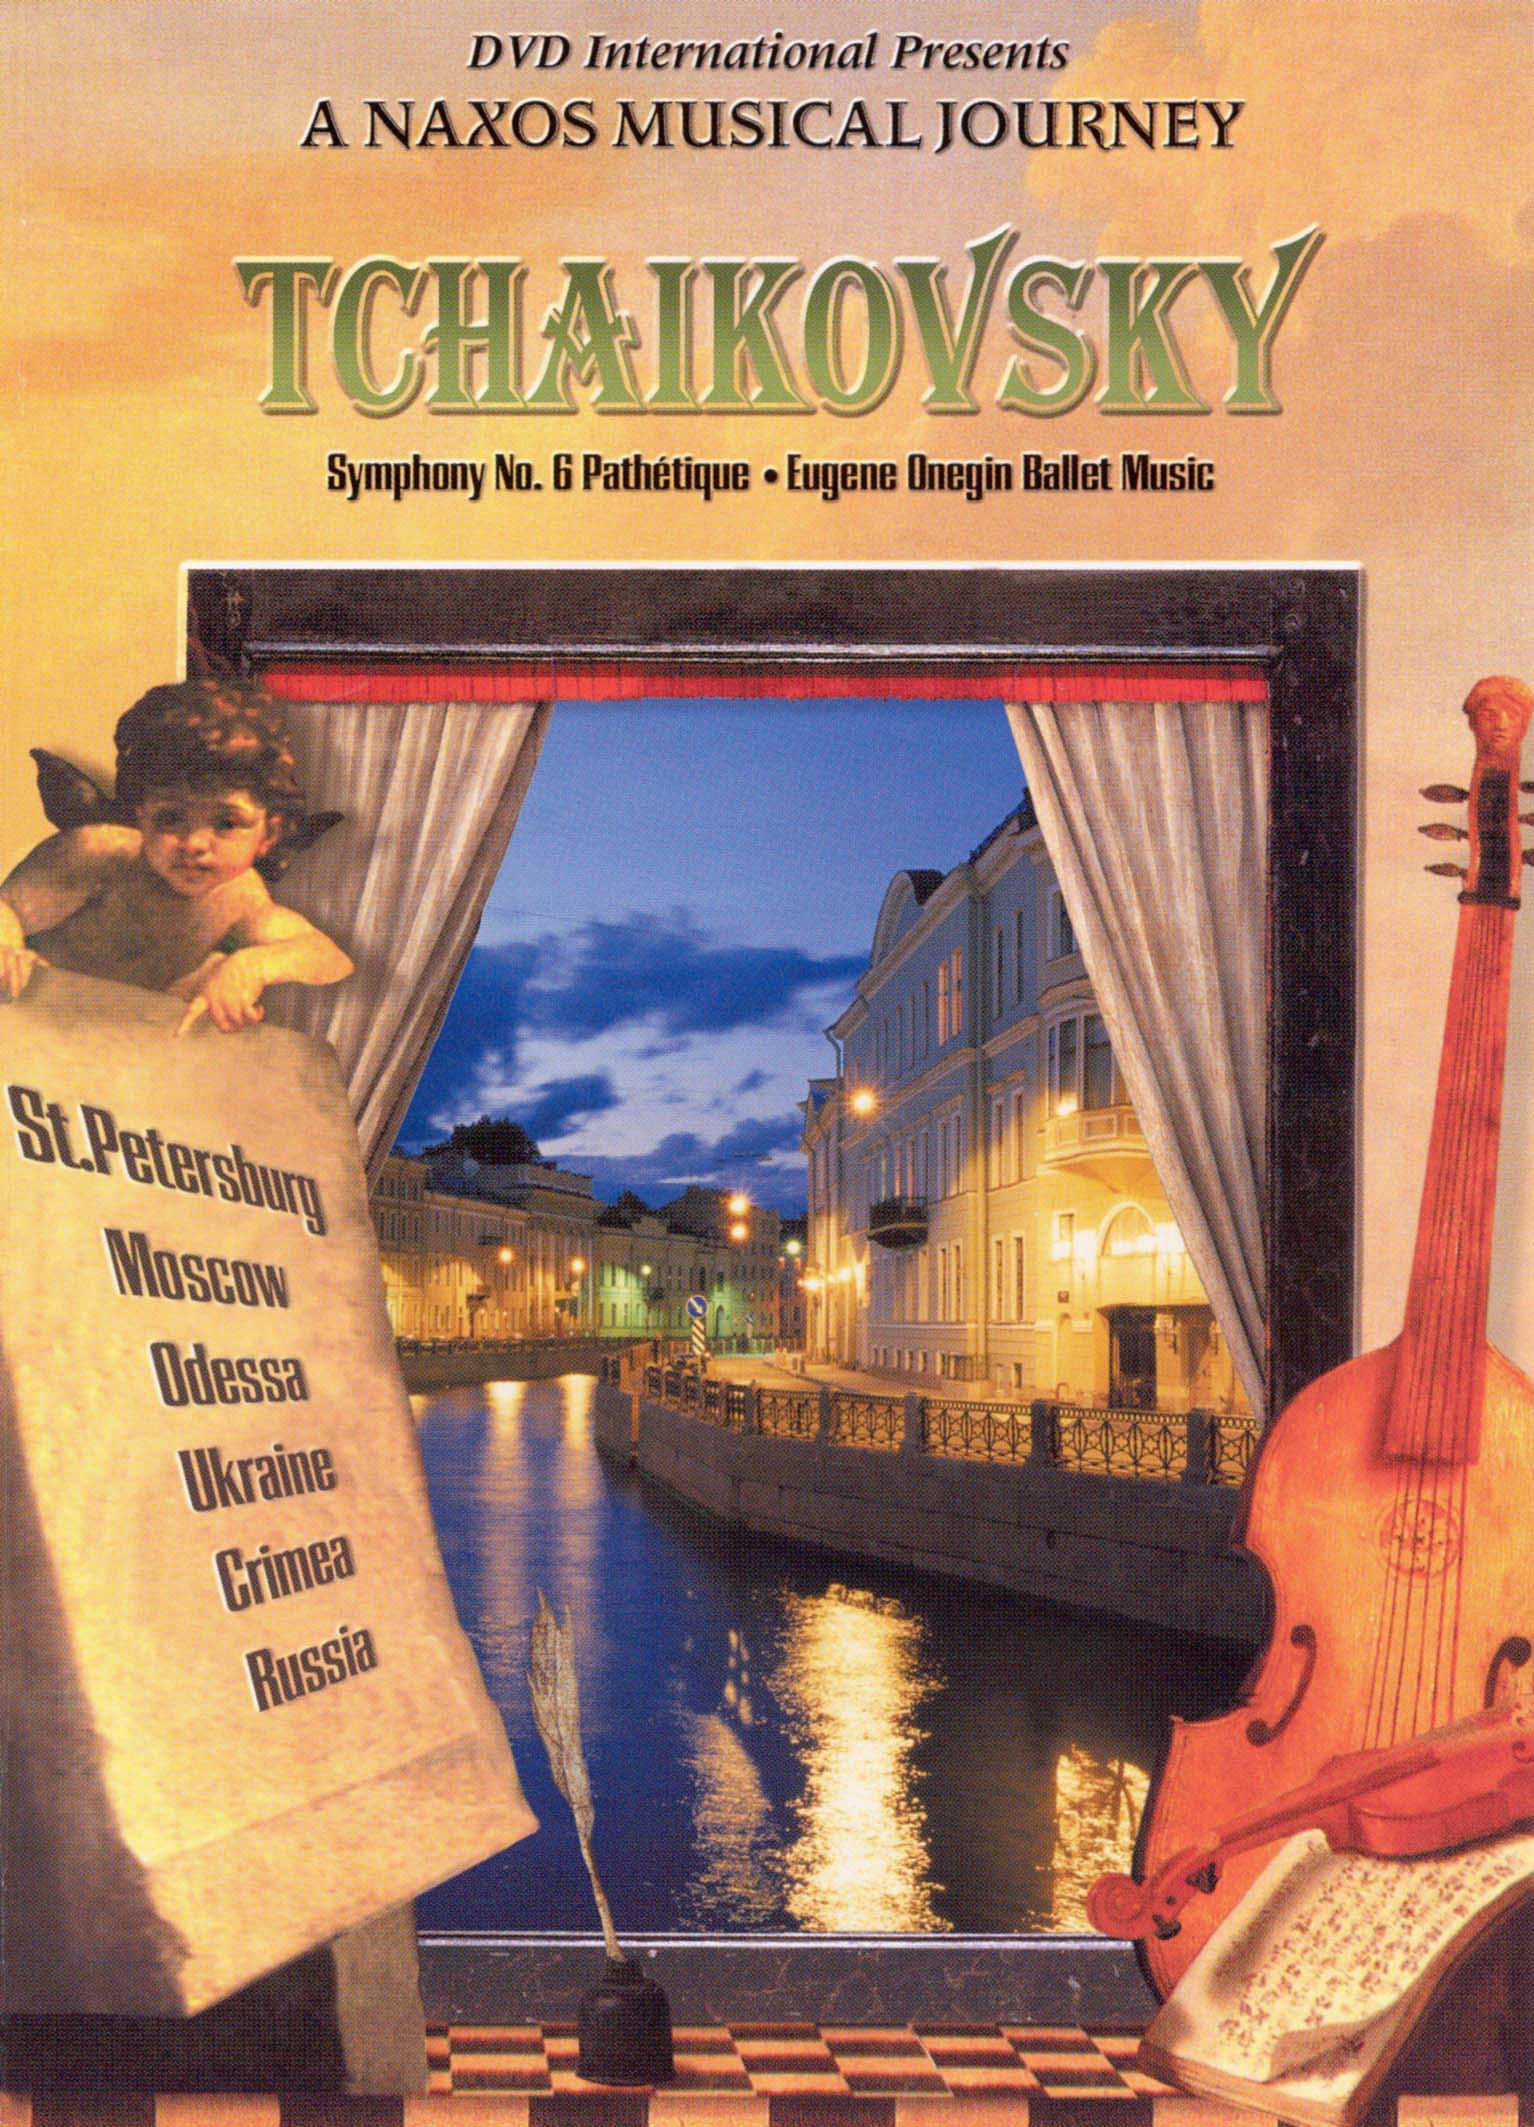 A Naxos Musical Journey: Tchaikovsky - Symphony No. 6 Pathetique/Eugene Onegin Ballet Music